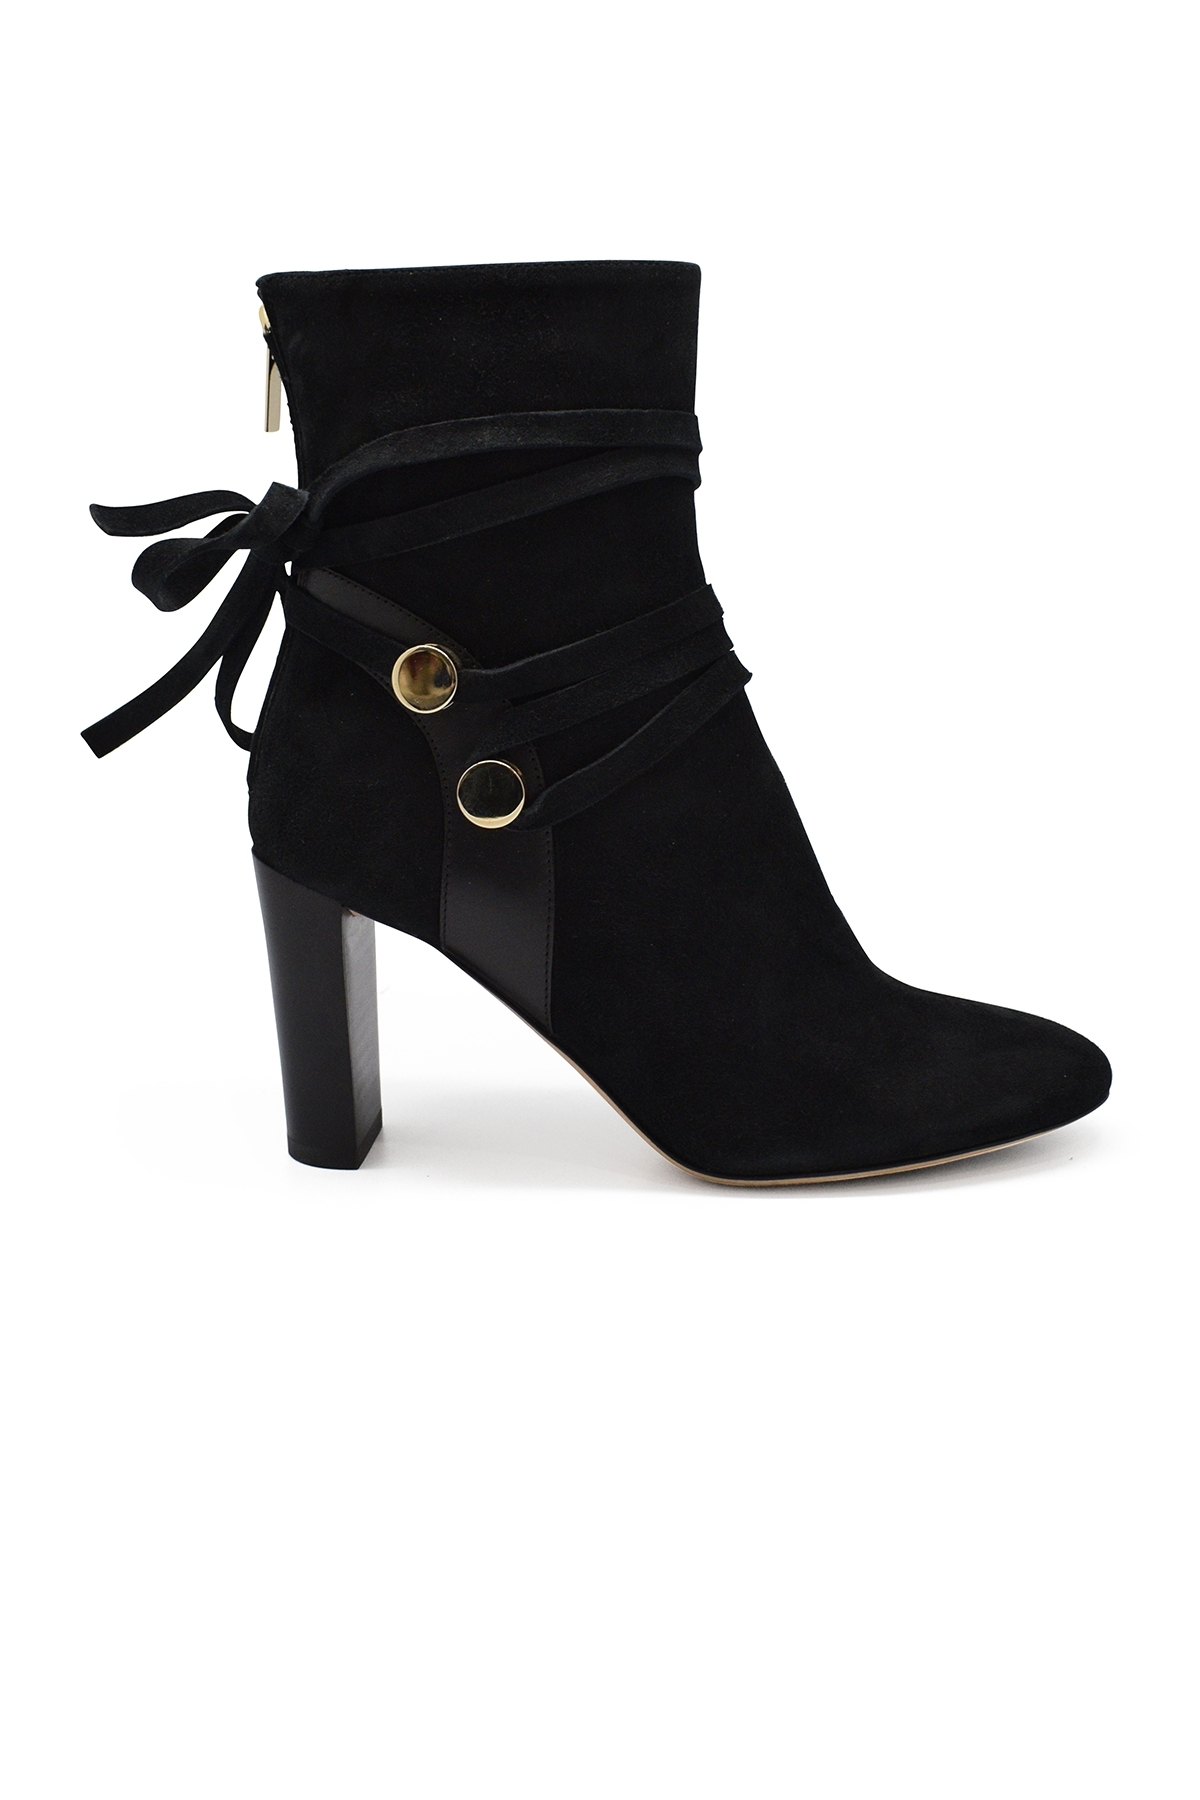 Houston 85 boots